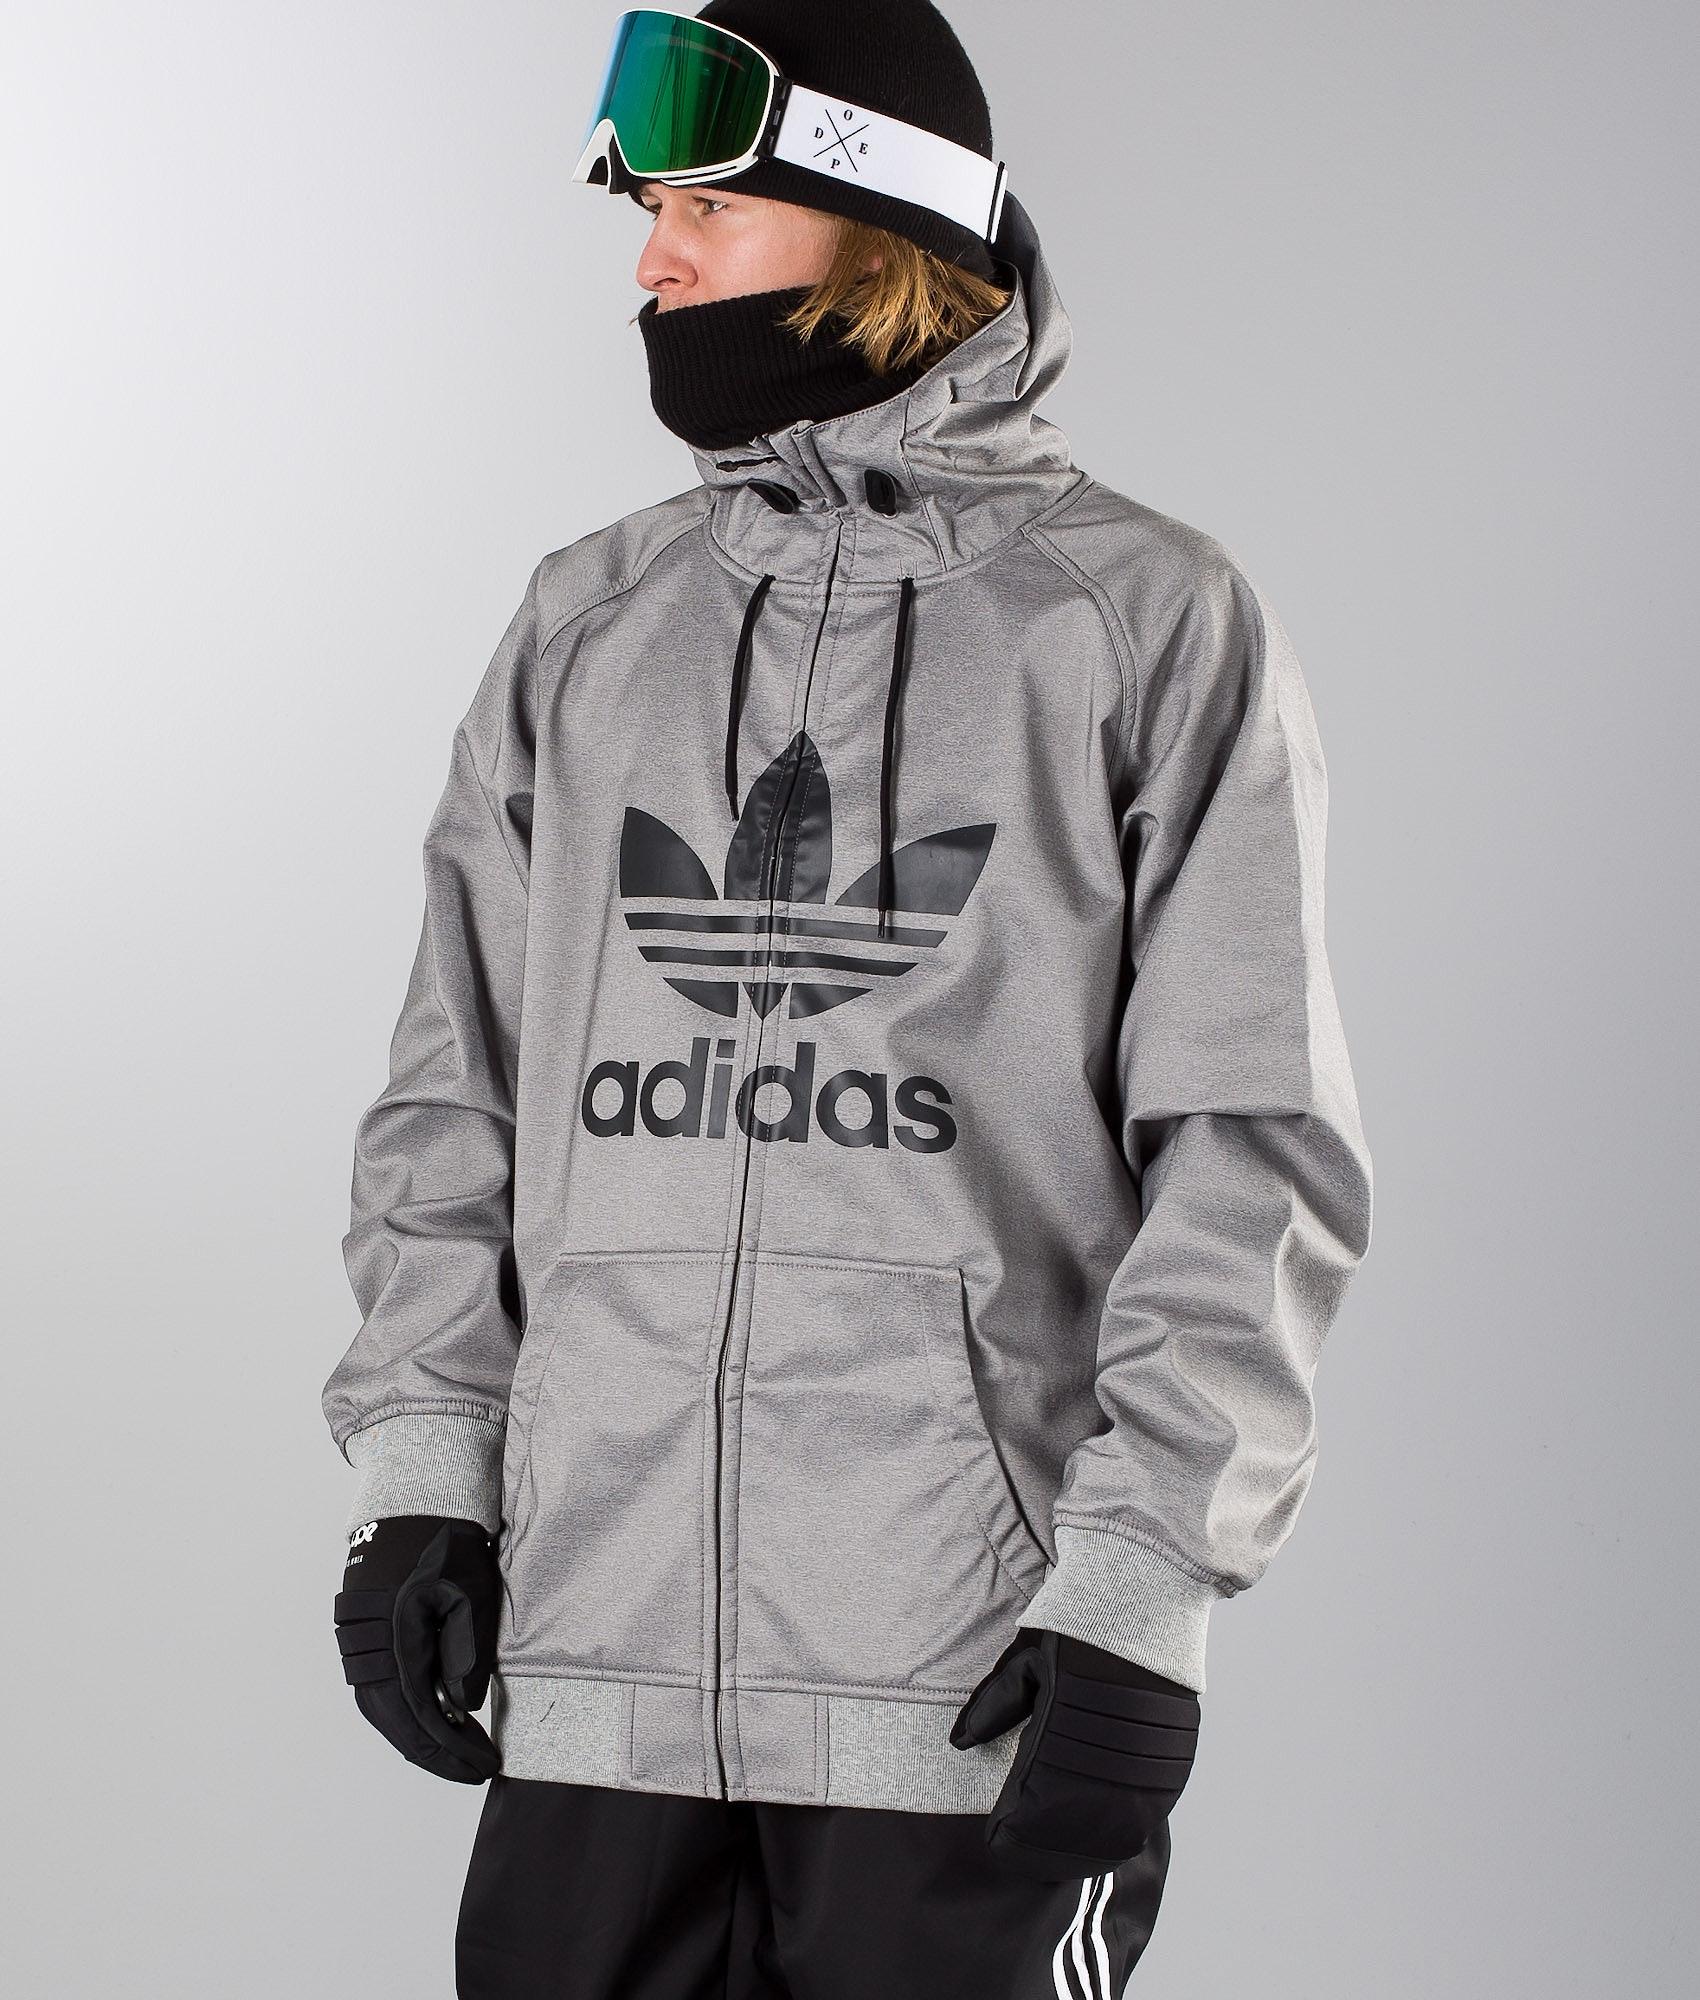 4d9eecd9 Adidas Snowboarding Greeley Corhtr/Black Snowboardklaer - Ridestore